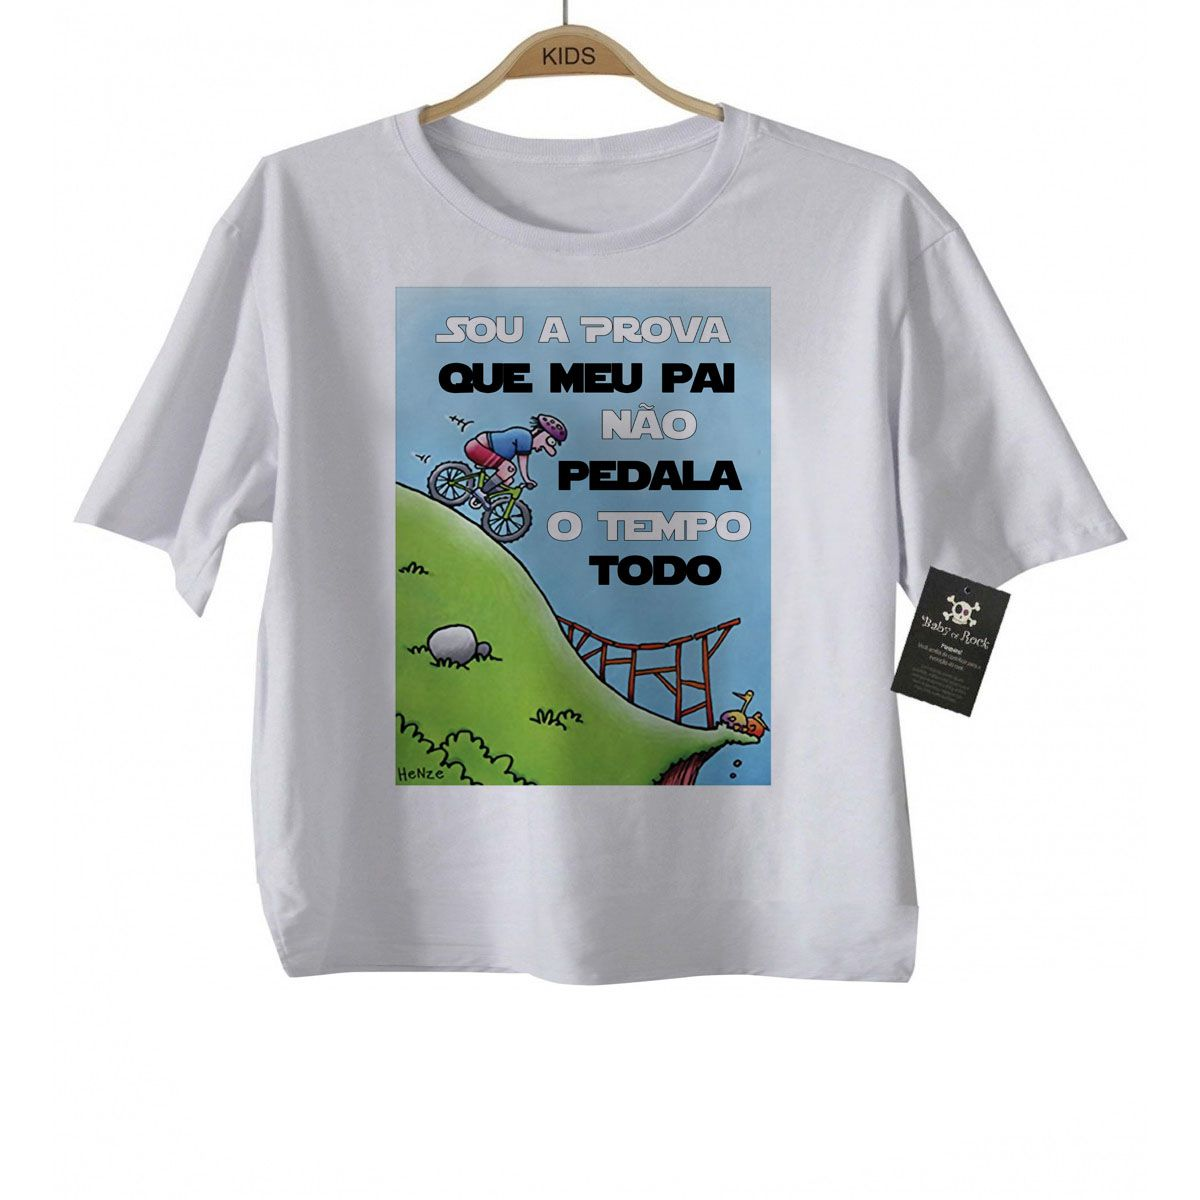 Camiseta Infantil  Sou a Prova Bike Tempo todo - White  - Baby Monster - Body Bebe